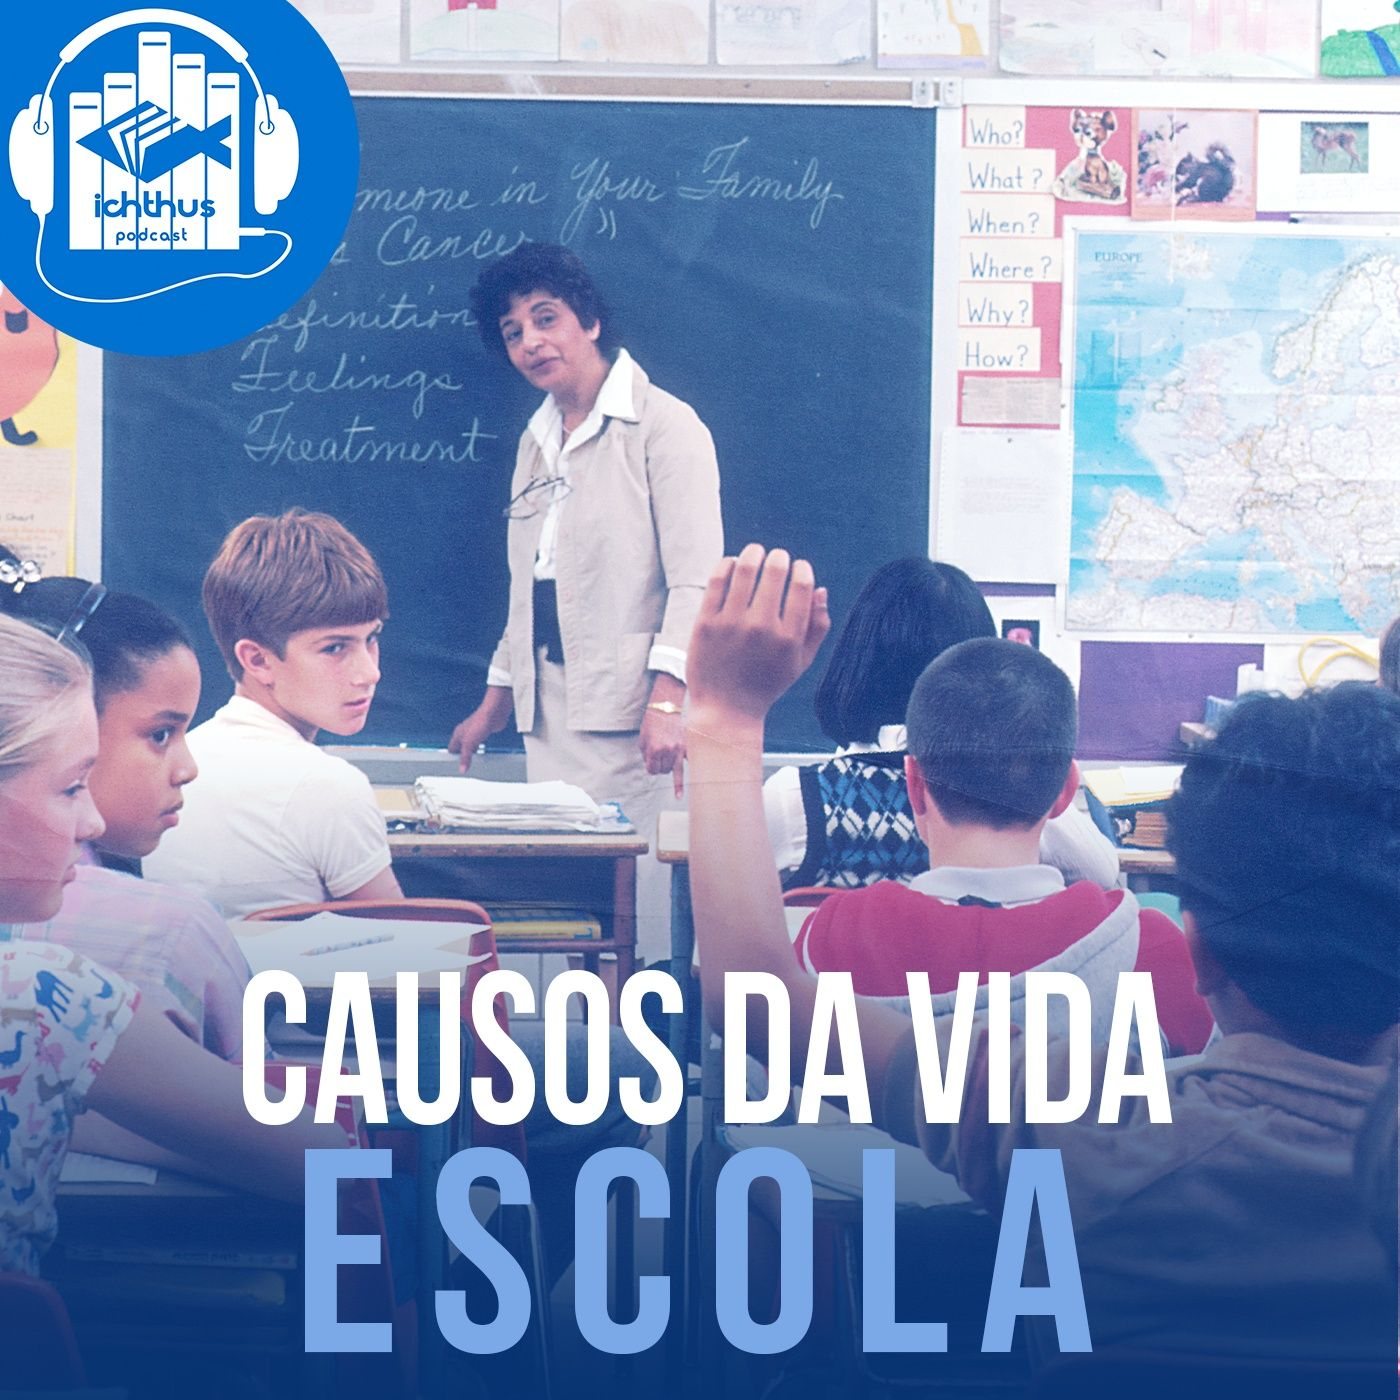 Escola | Causos da vida